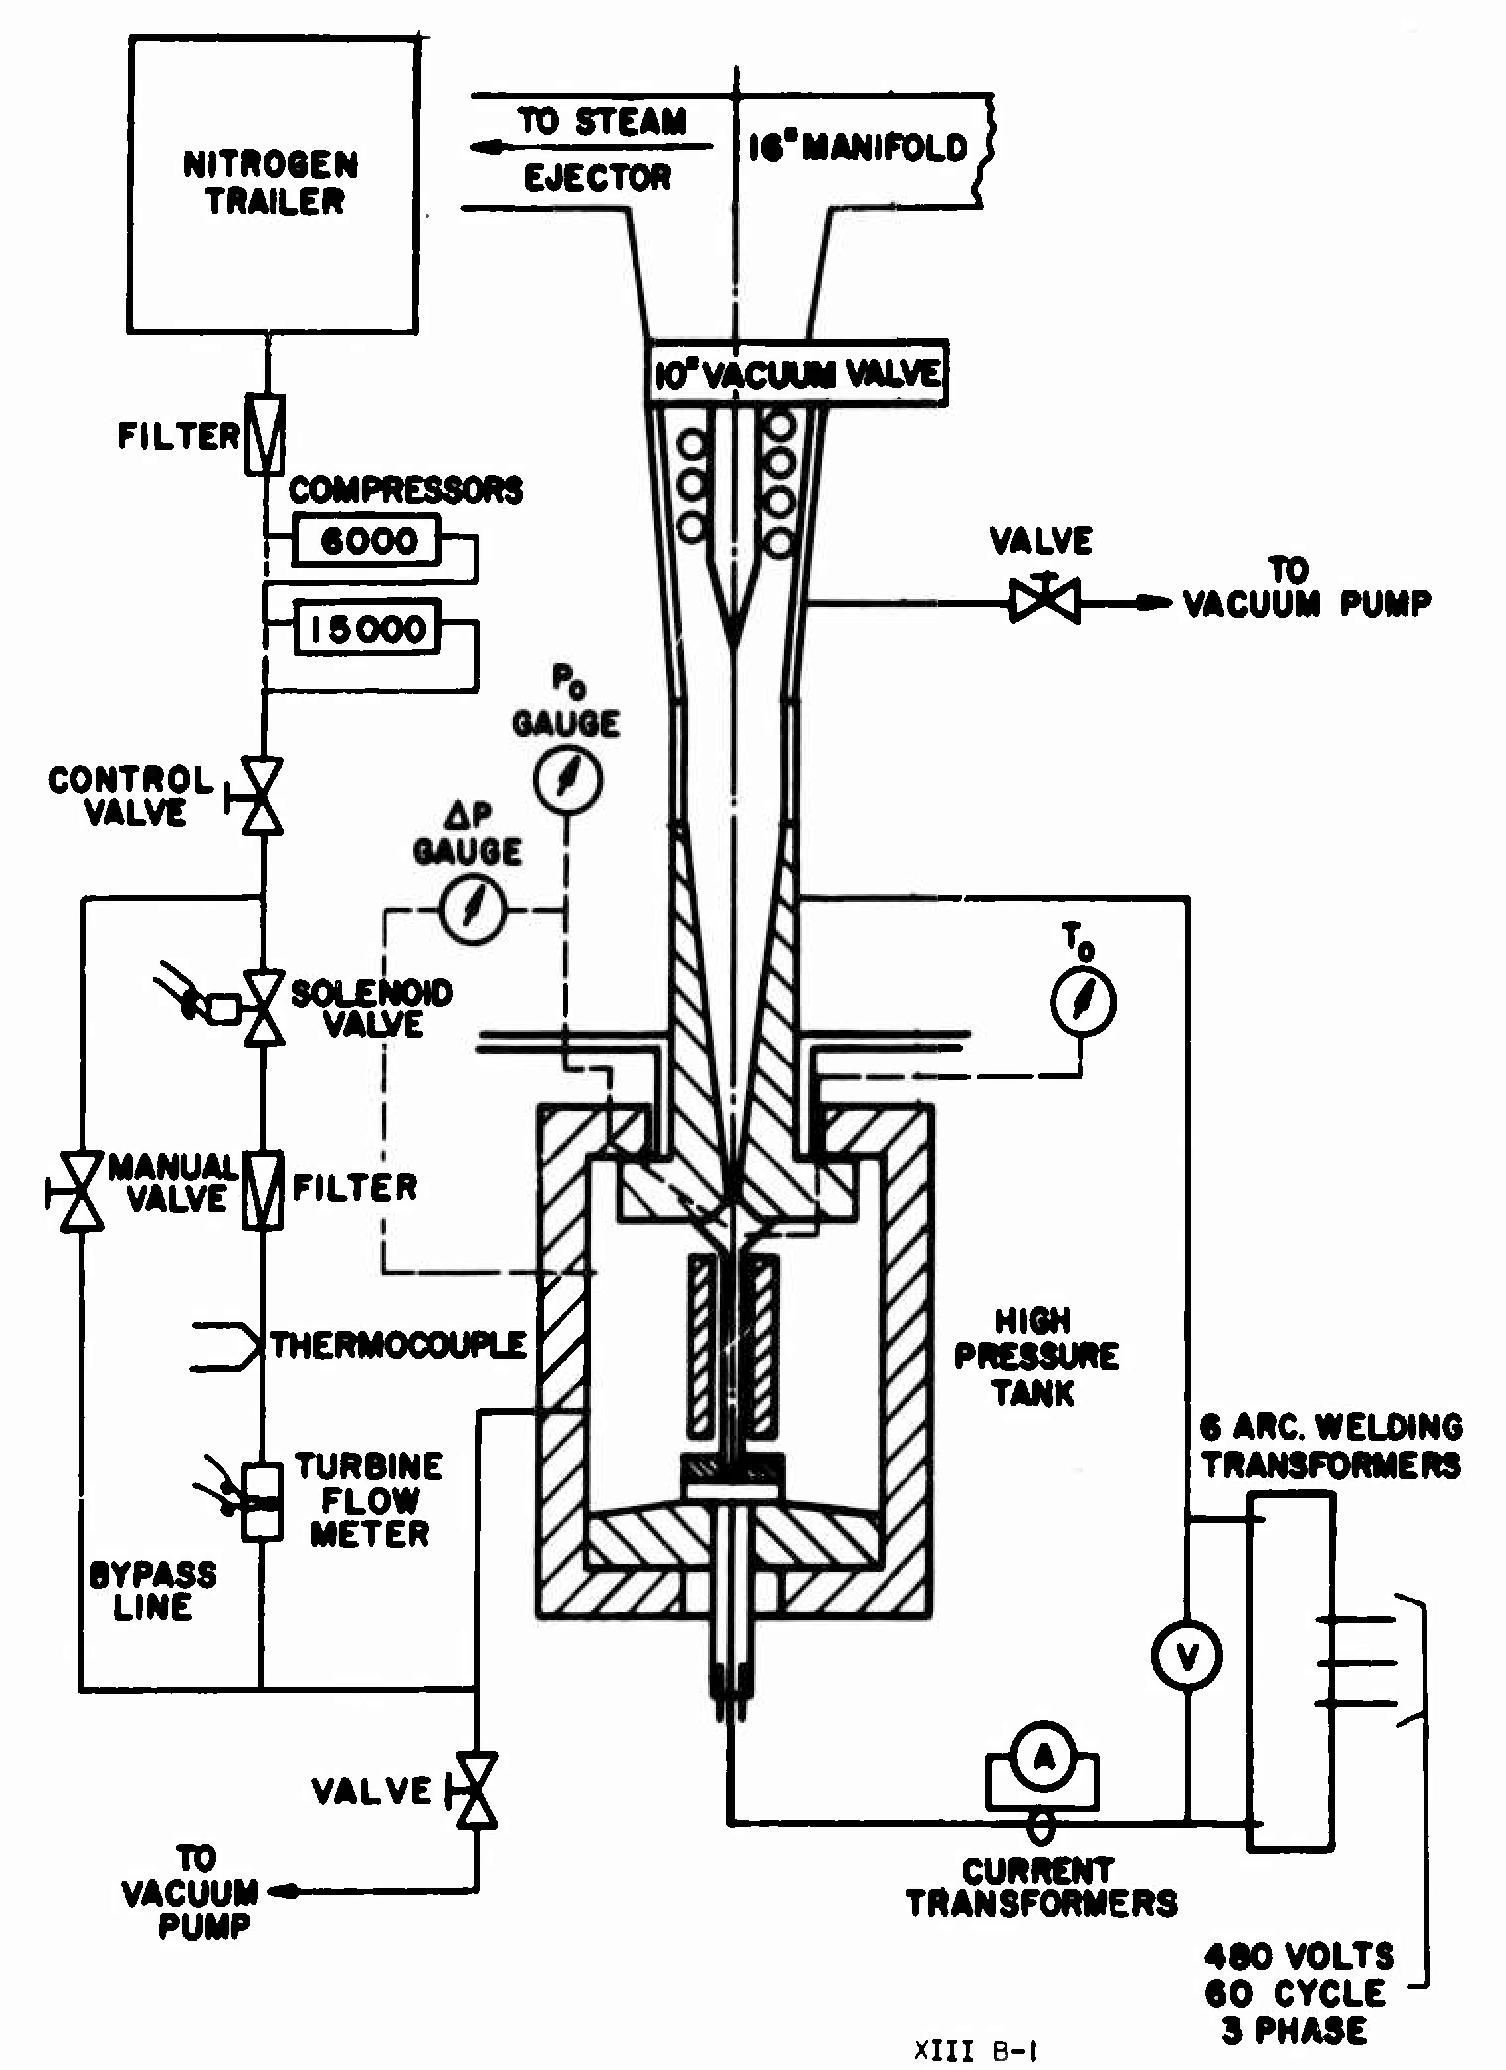 hight resolution of figure i line diagram uf the high pressure high temperature nitrogen facility